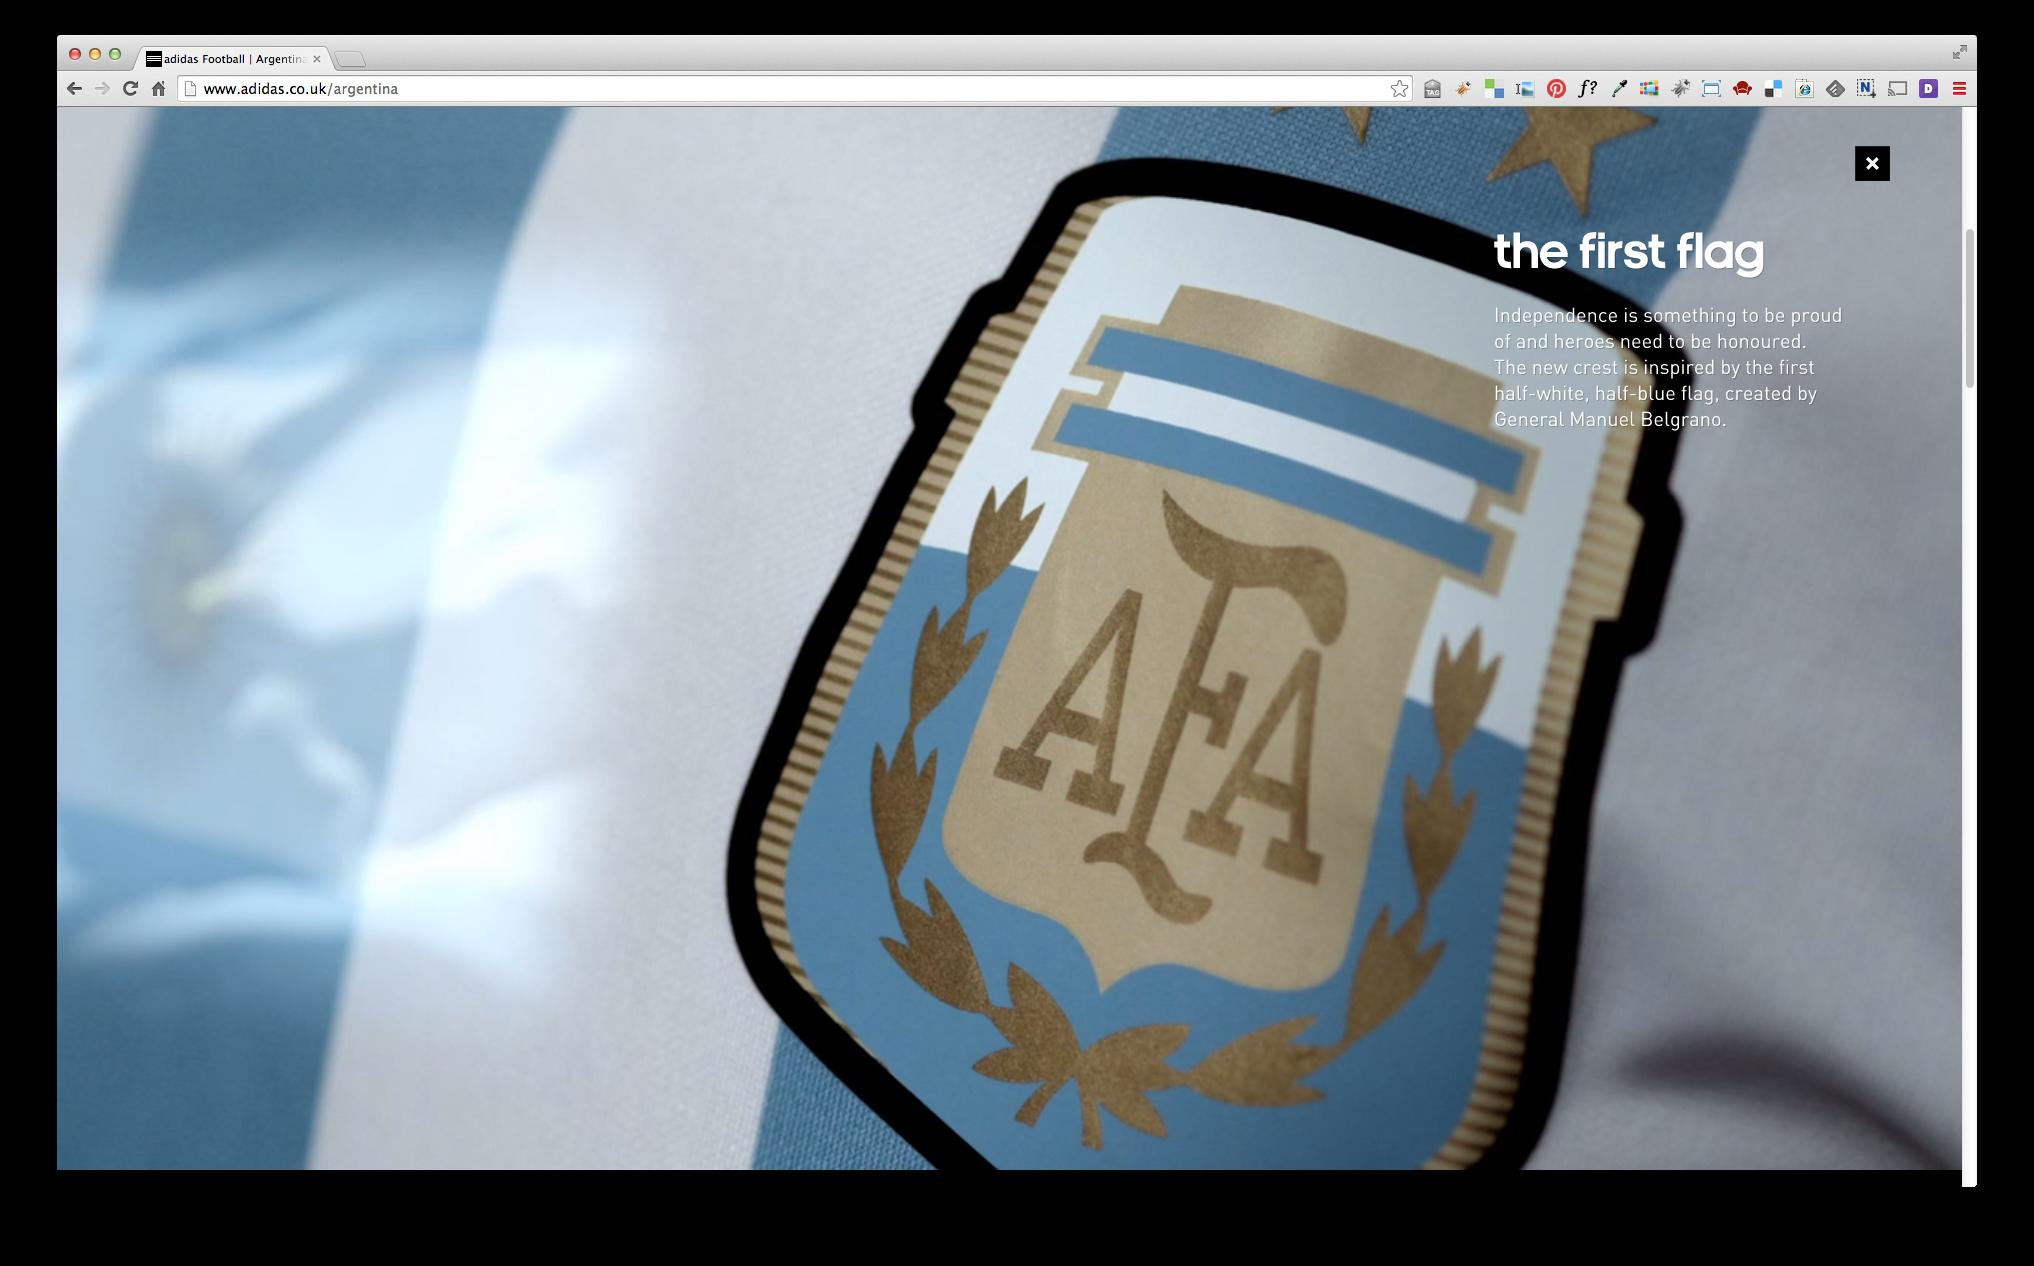 Screenshot 2014-06-24 20.47.42.png